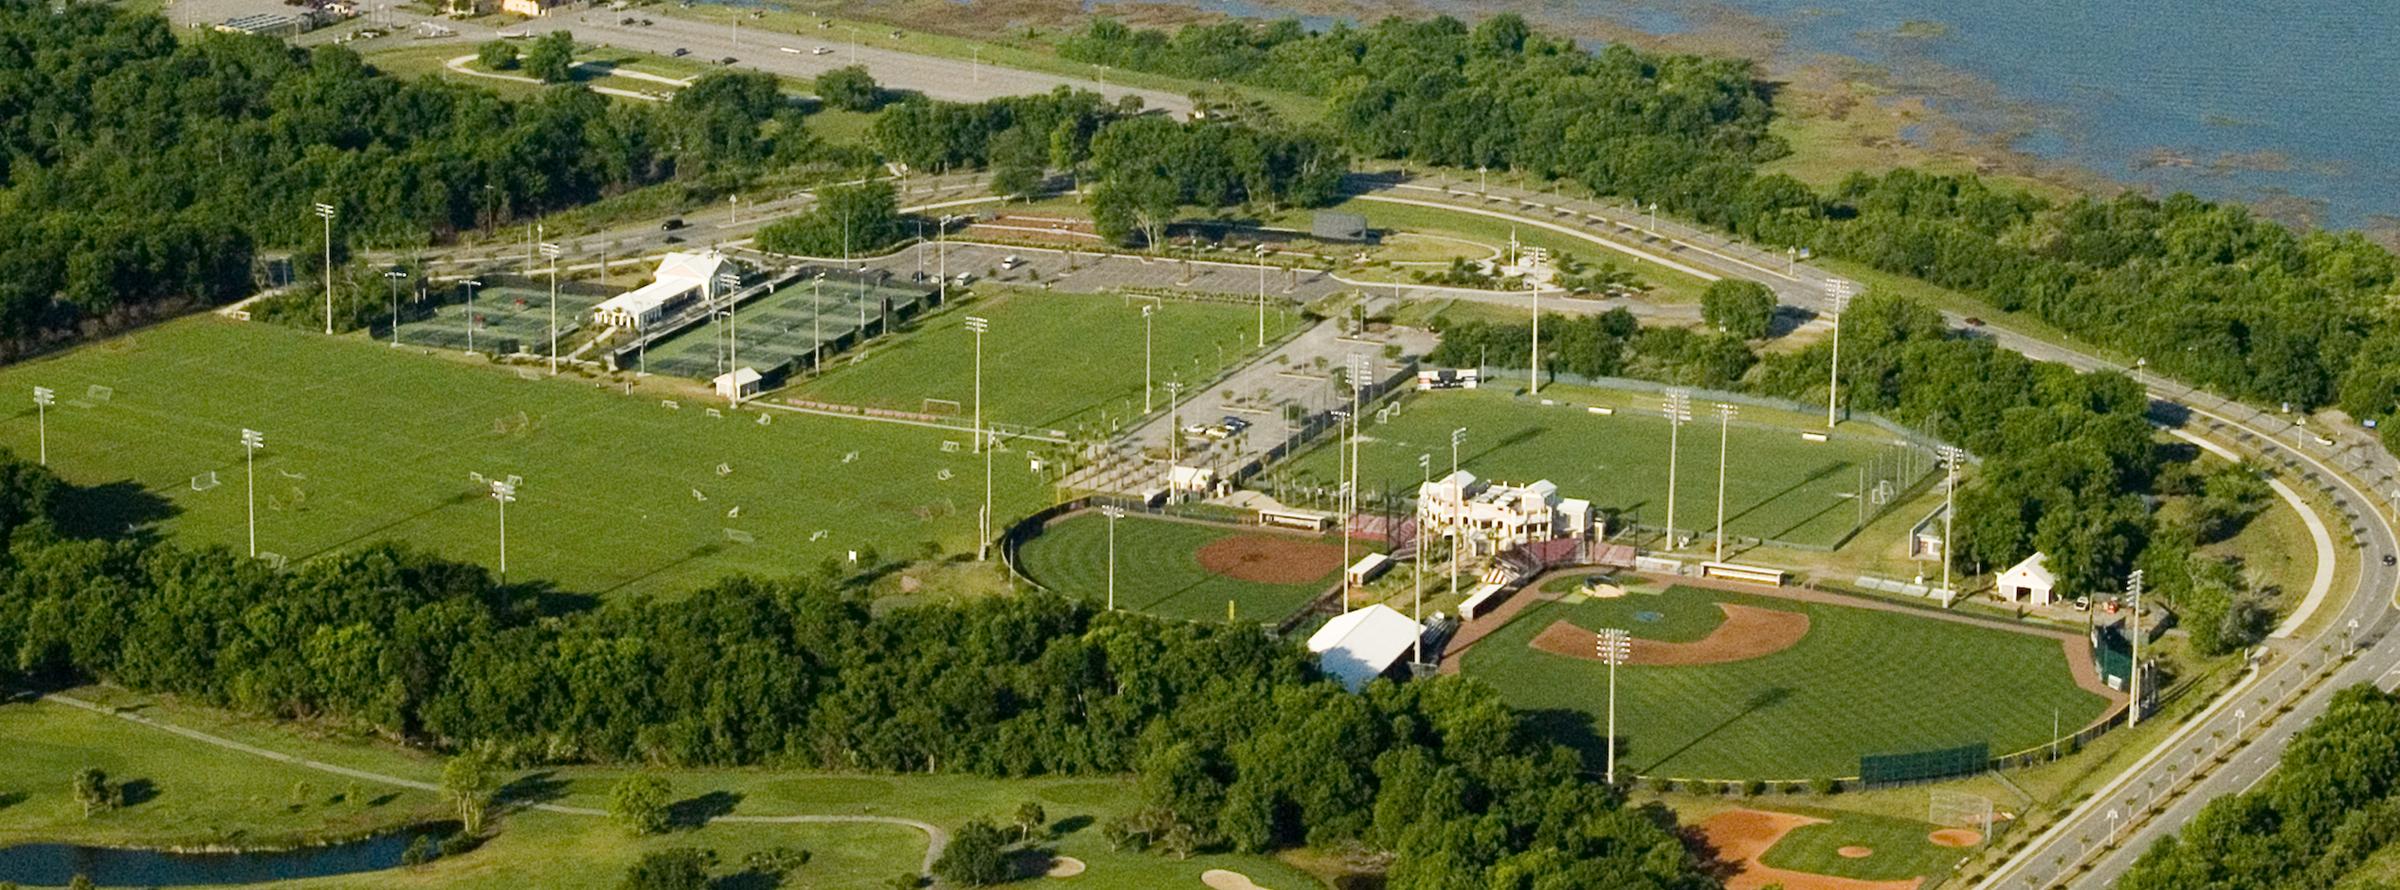 Athletic Training Programs Long Island